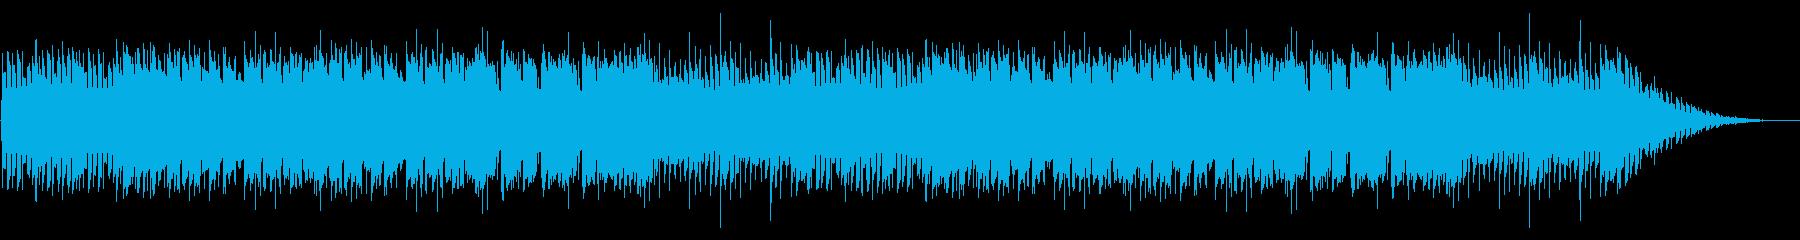 NES アクションC06-1(ステージ4の再生済みの波形